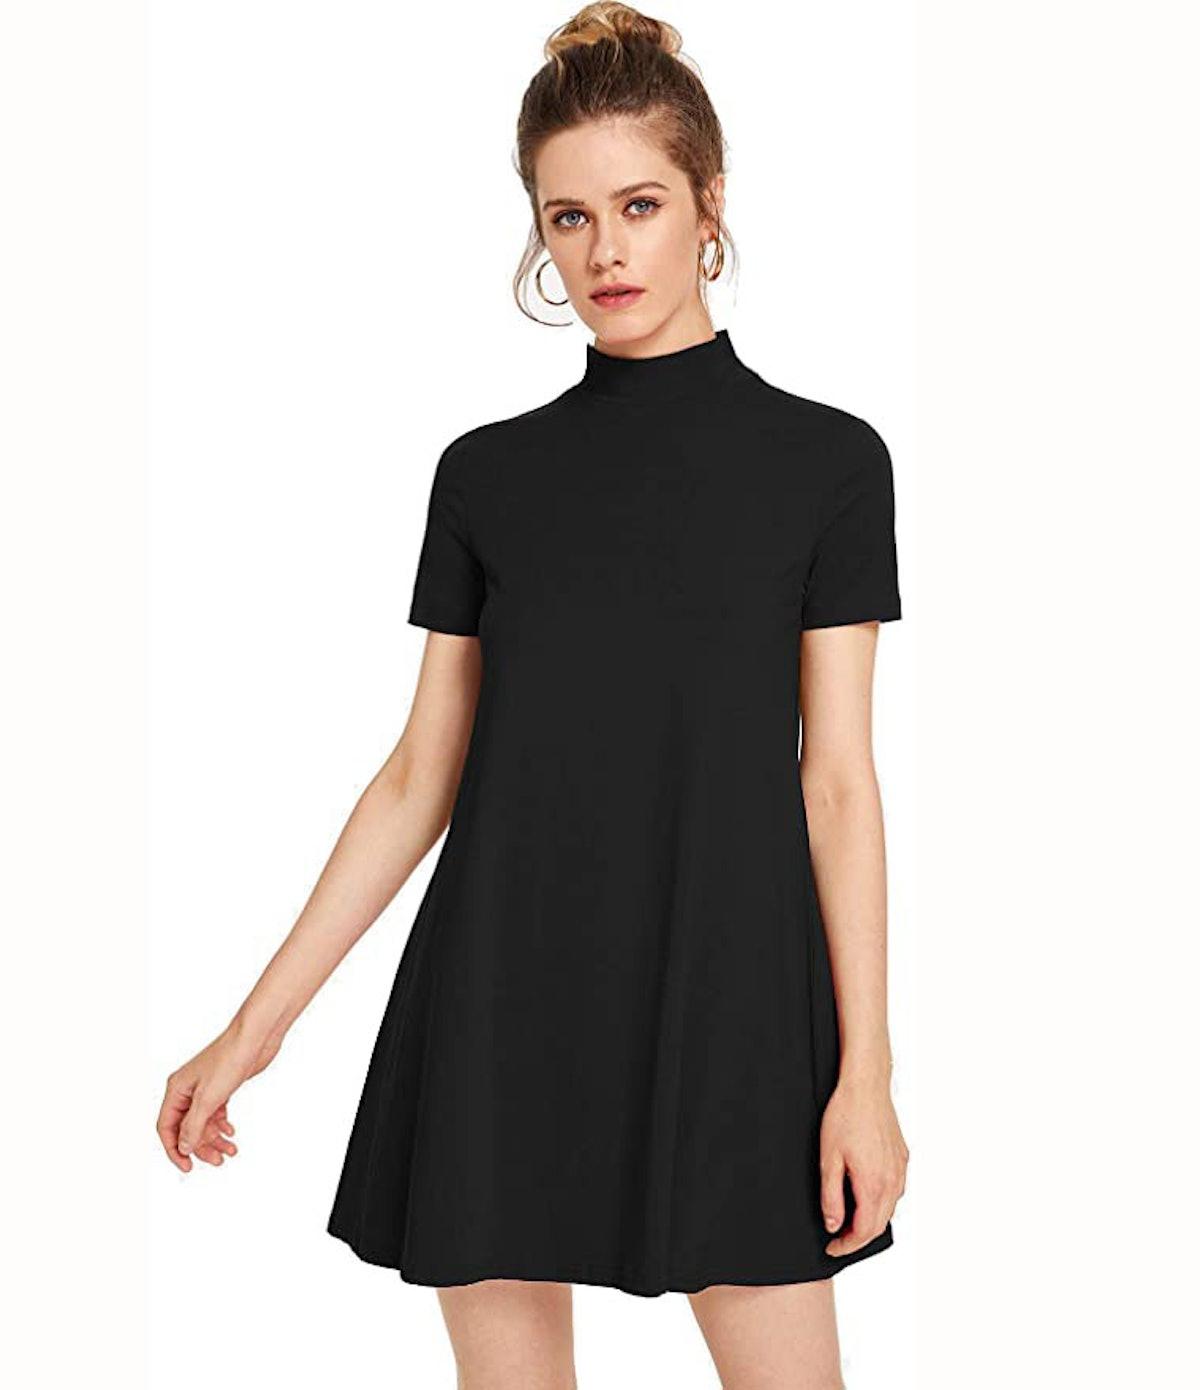 Milumia Short Sleeve Mock Neck T Shirt Dress